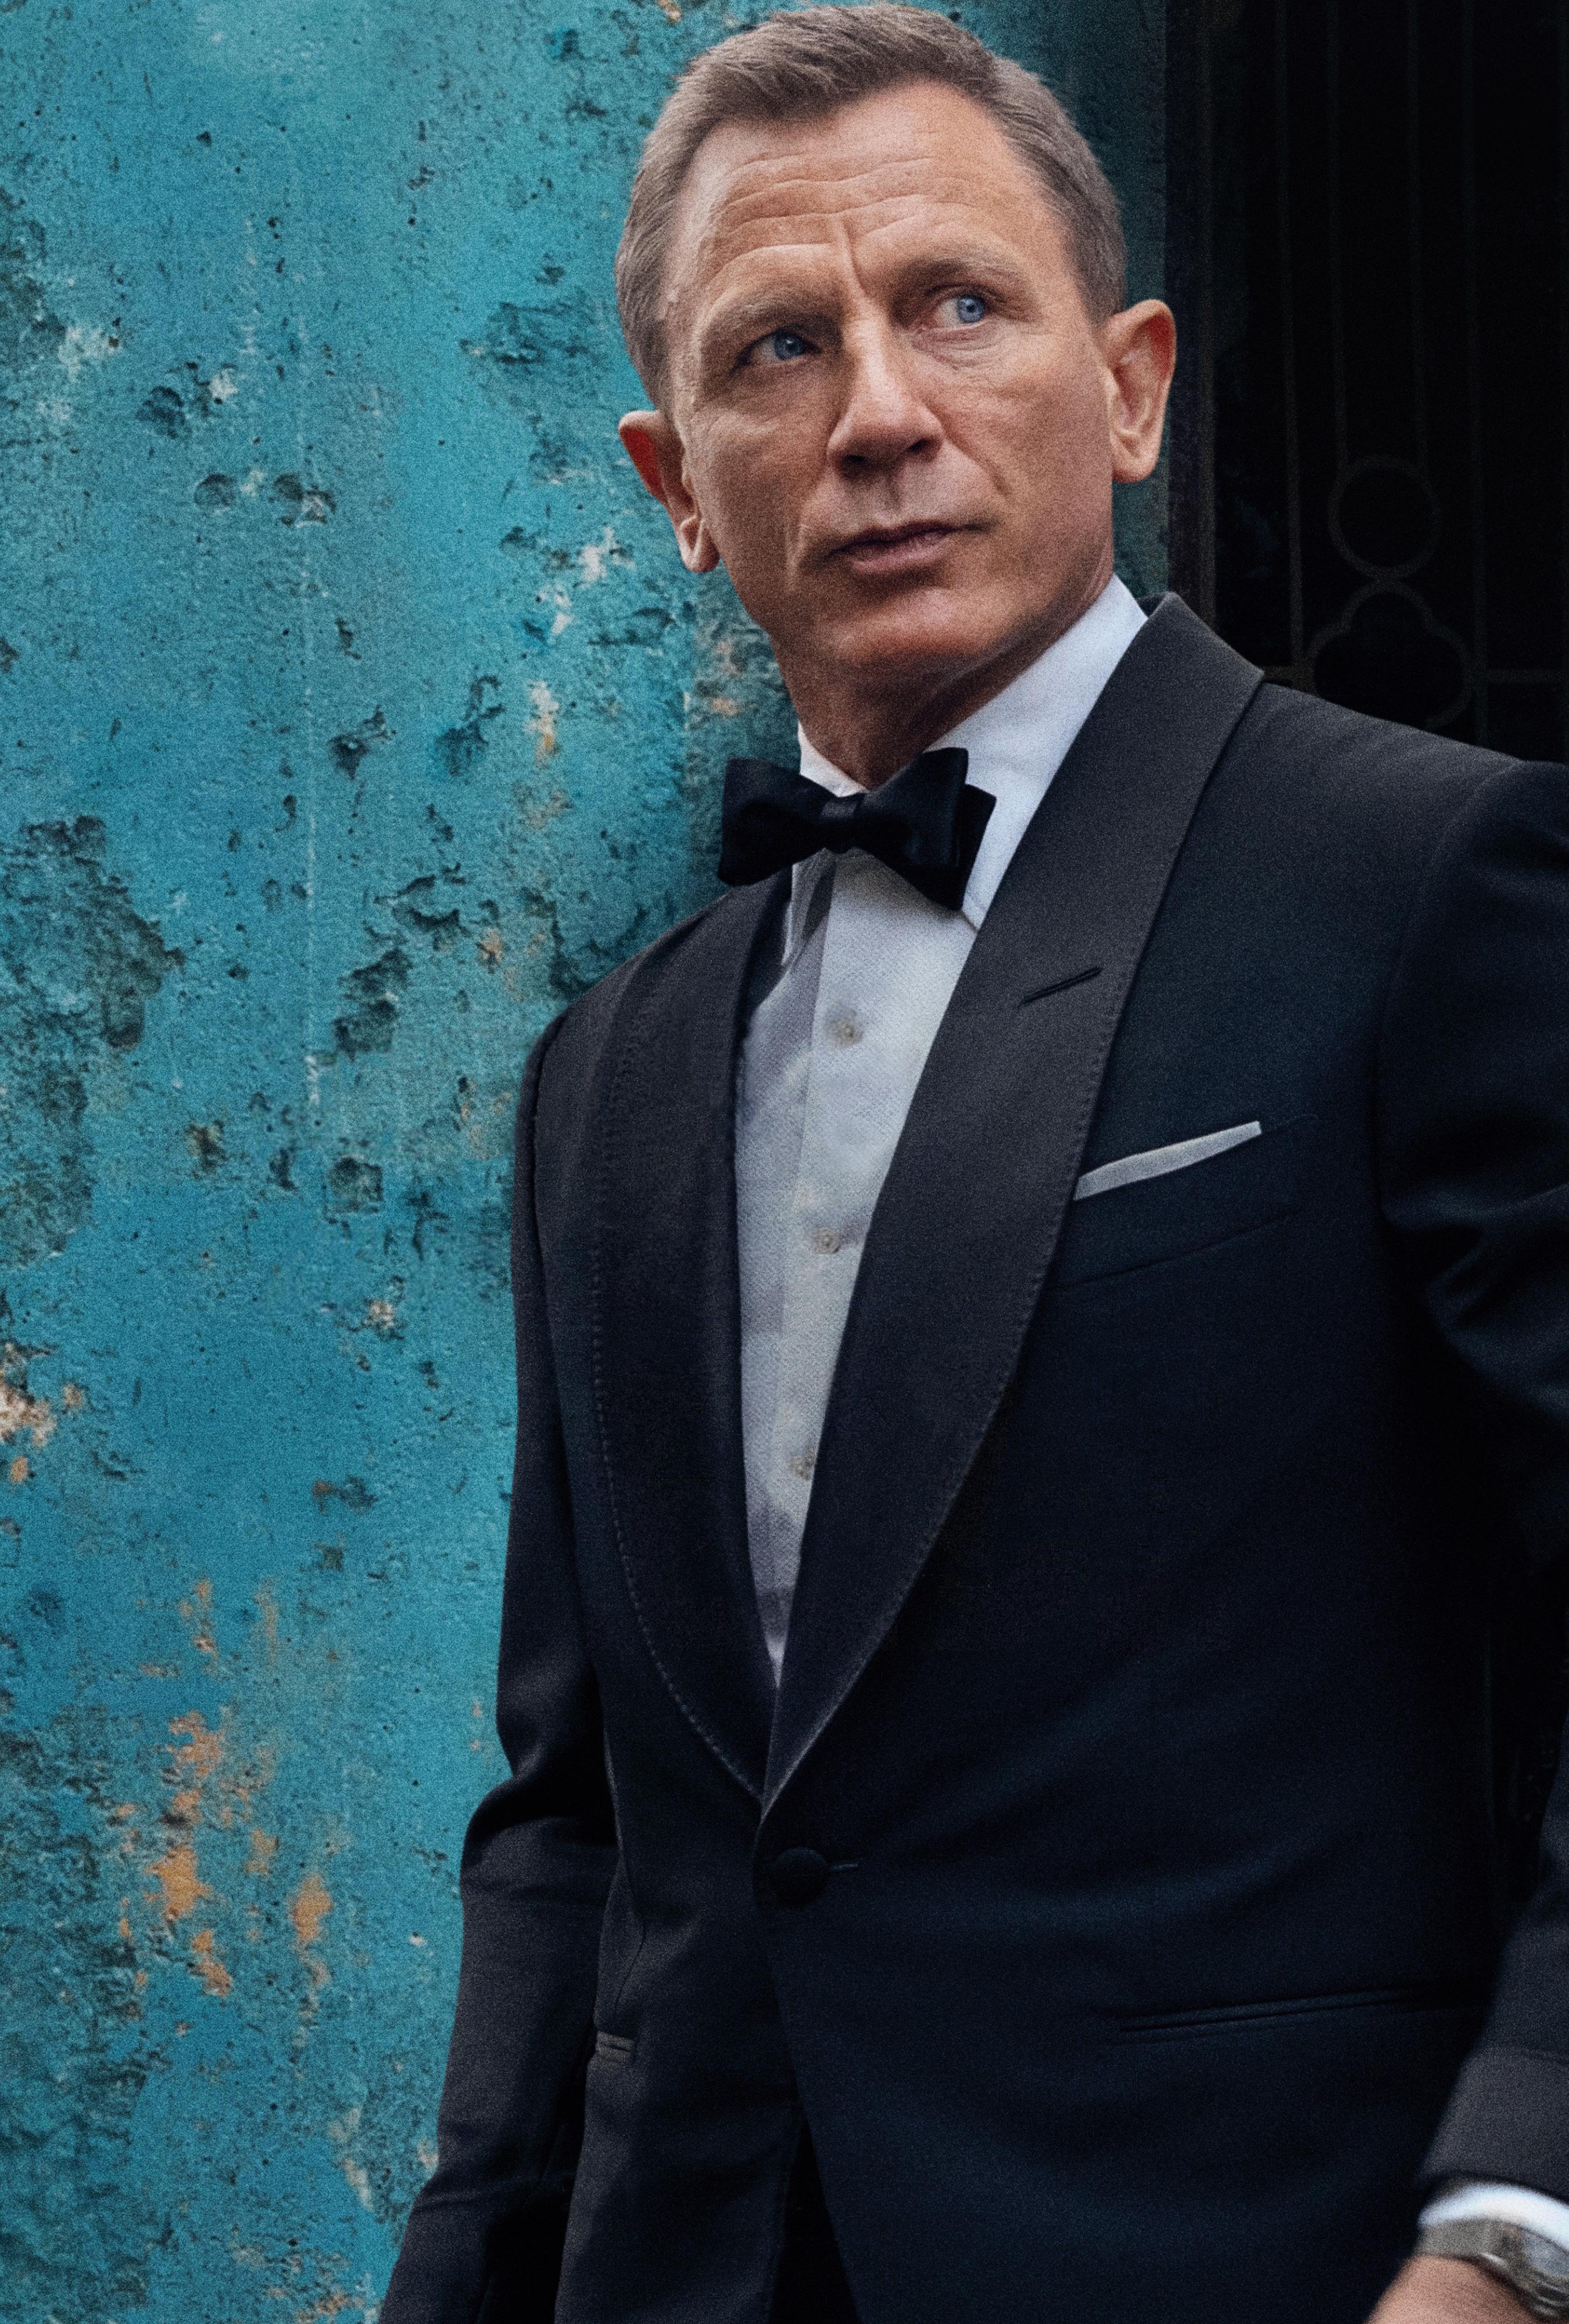 No Time to Die James Bond Wallpaper, HD Movies 4K ...